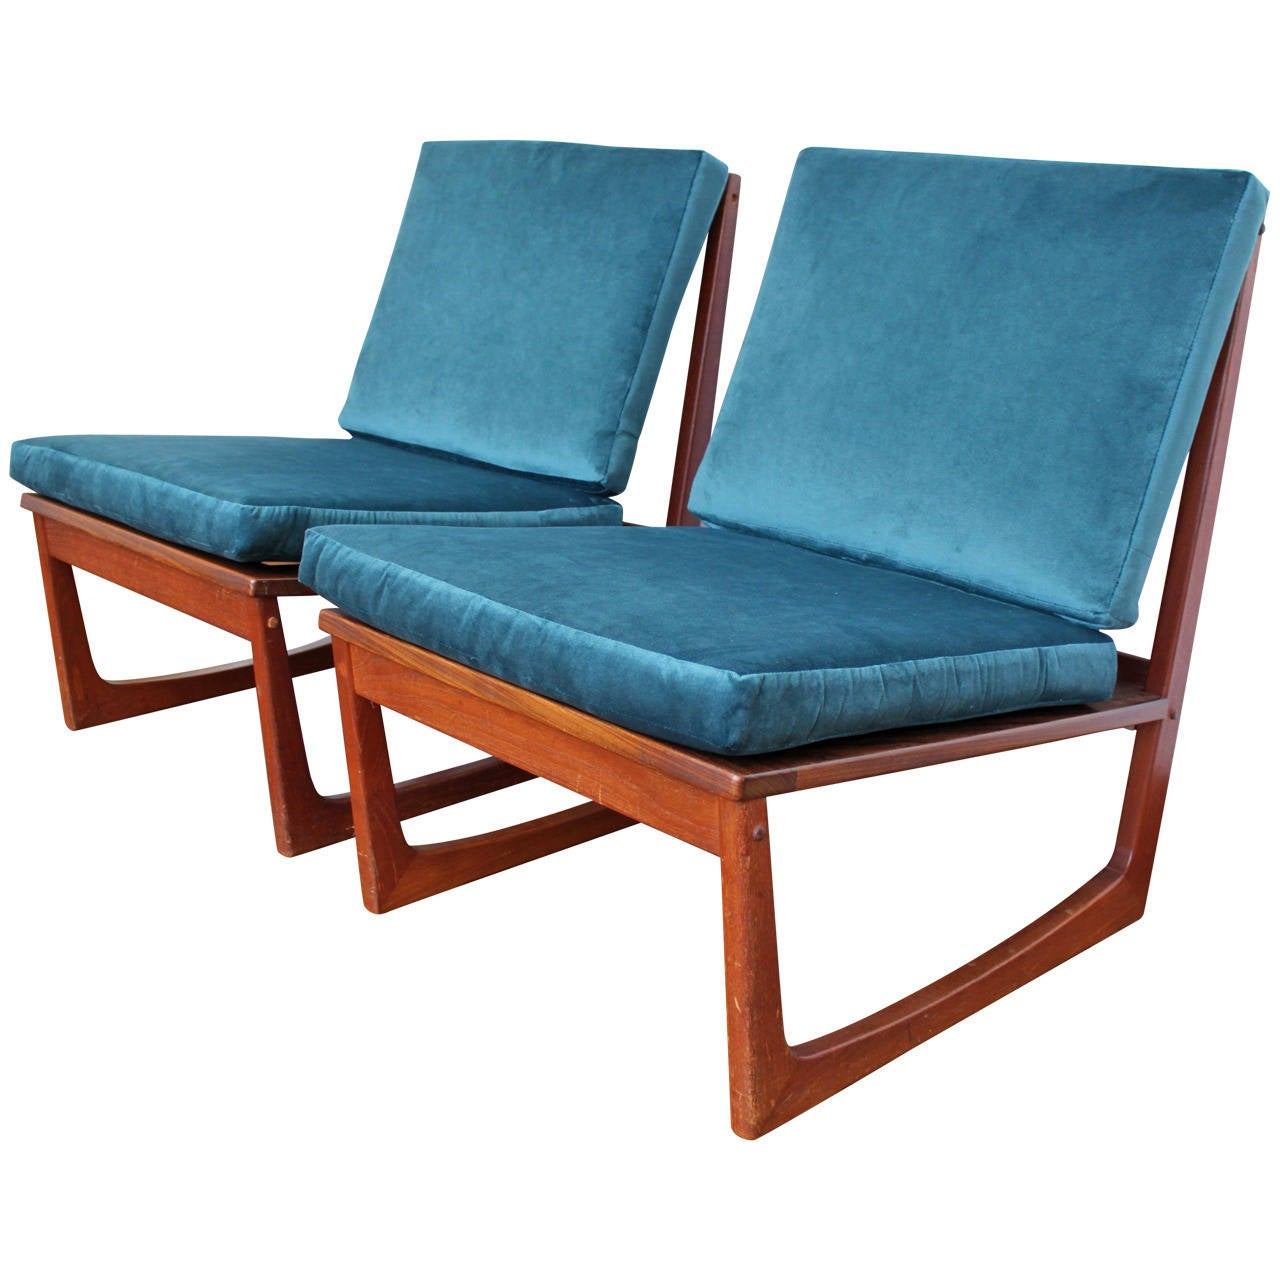 Pair Of Danish Teak Mid Century Chairs By Jacob Kjaer At 1stdibs